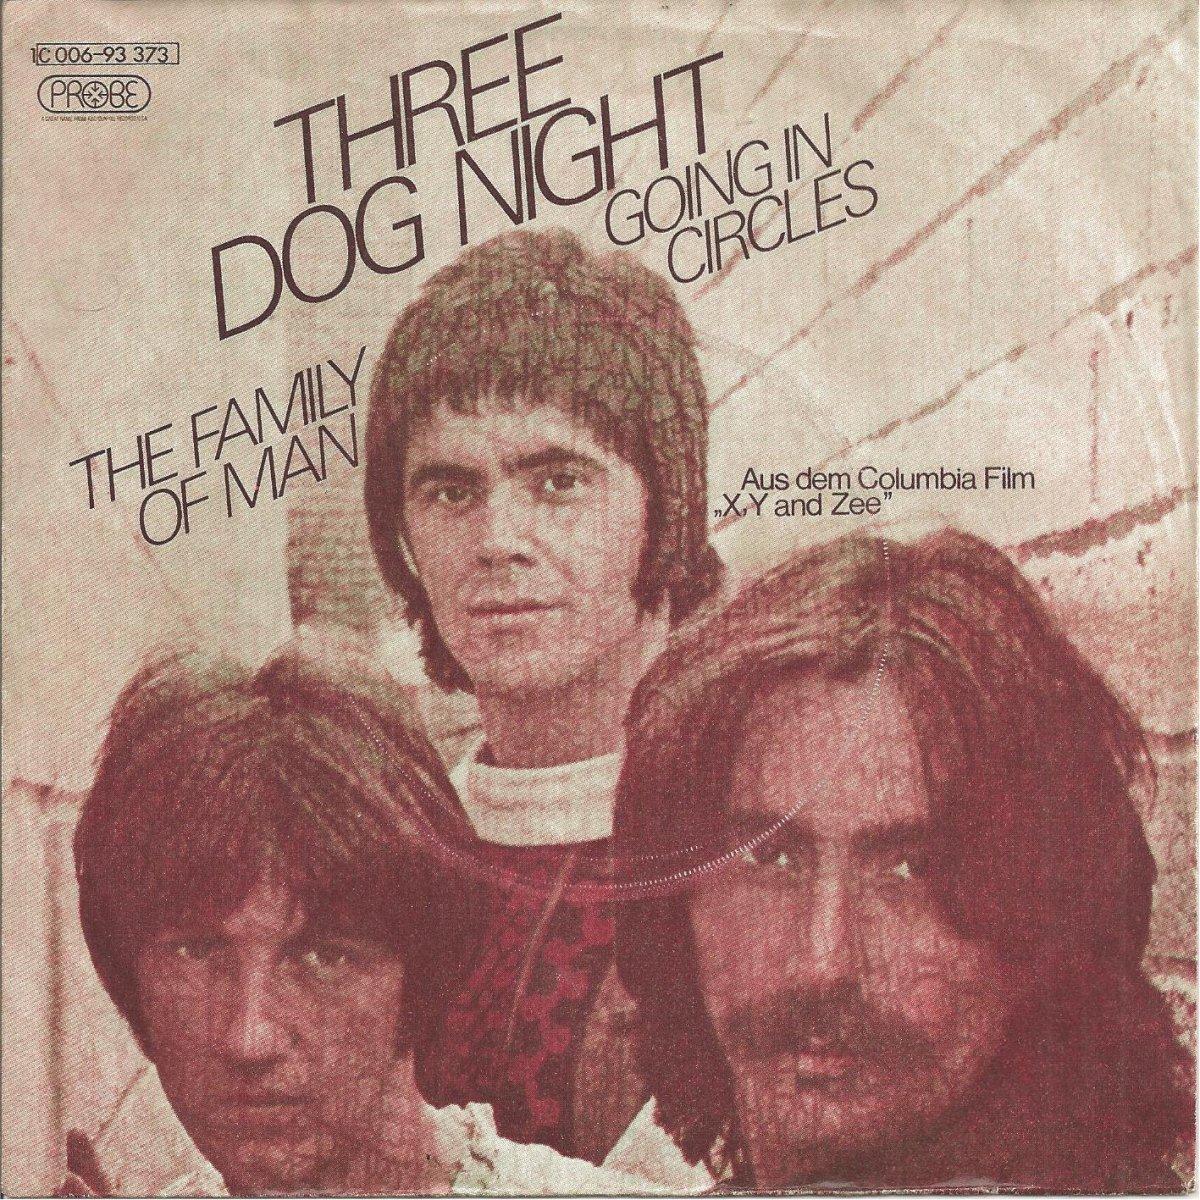 Three Dog Night – The Family OfMan